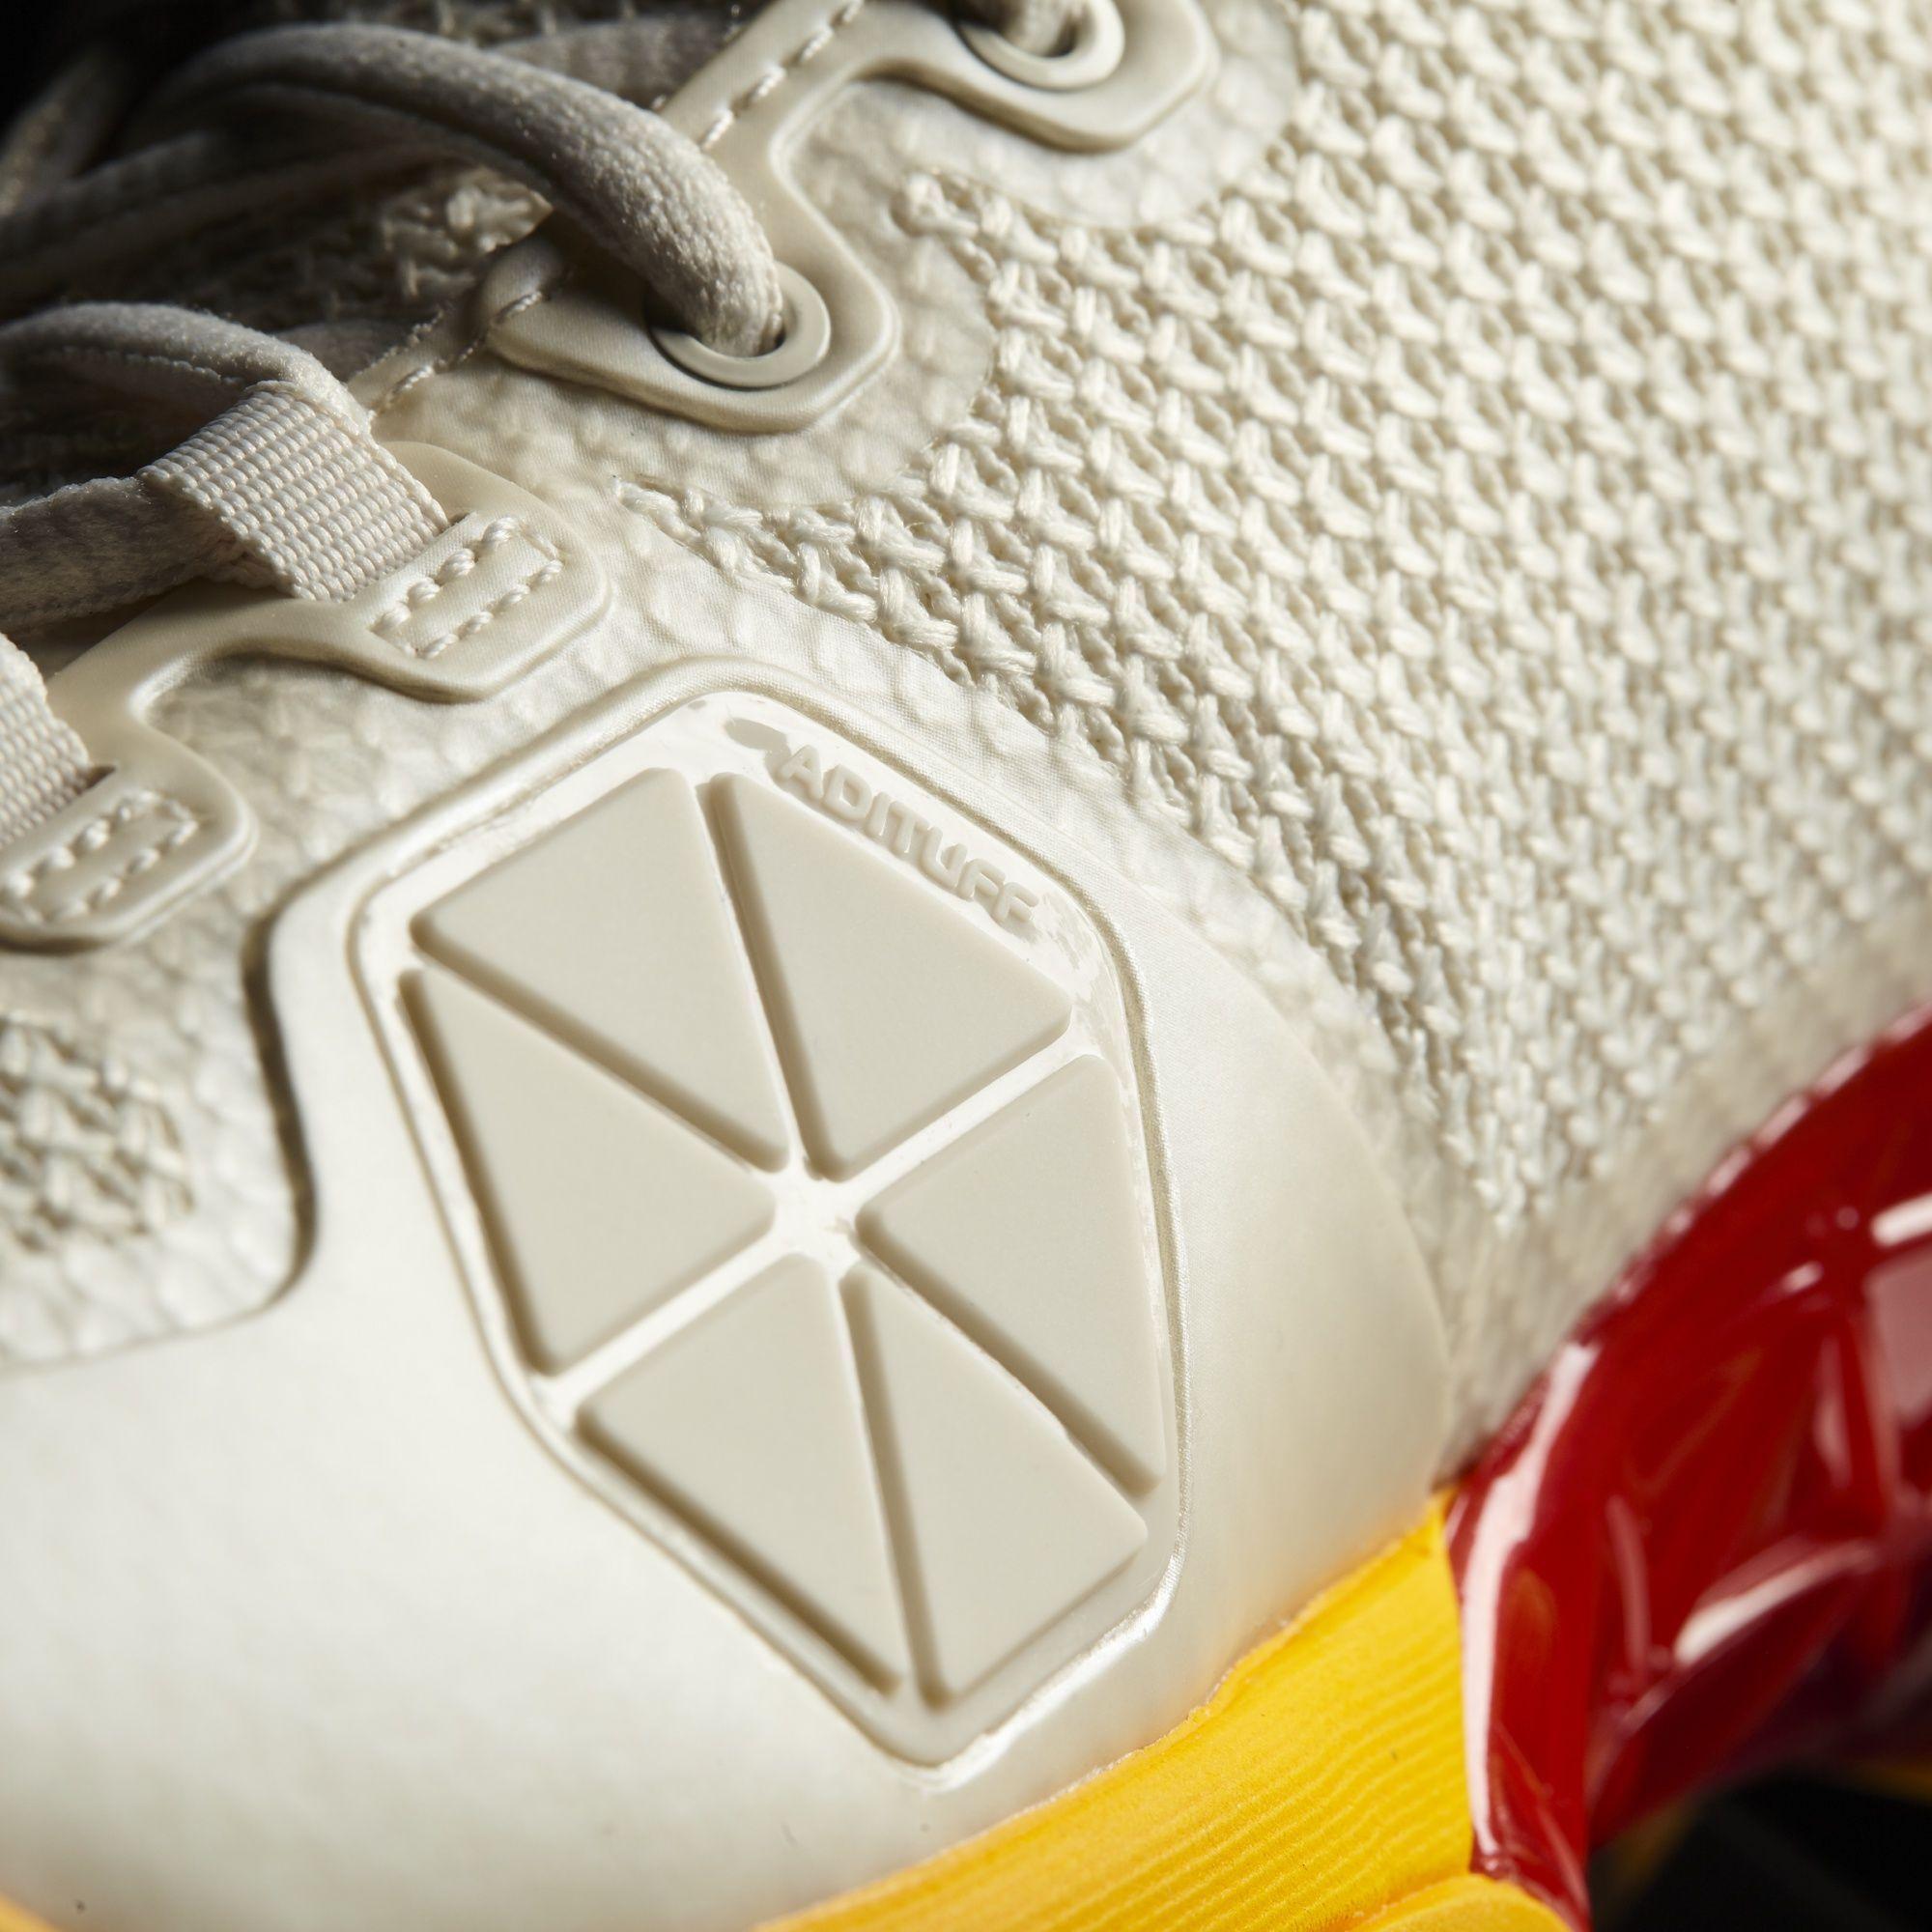 adidas - Chaussure Barricade 2017 Pharrell Williams https   twitter .com ShoesEgminfmn 2beda03f32